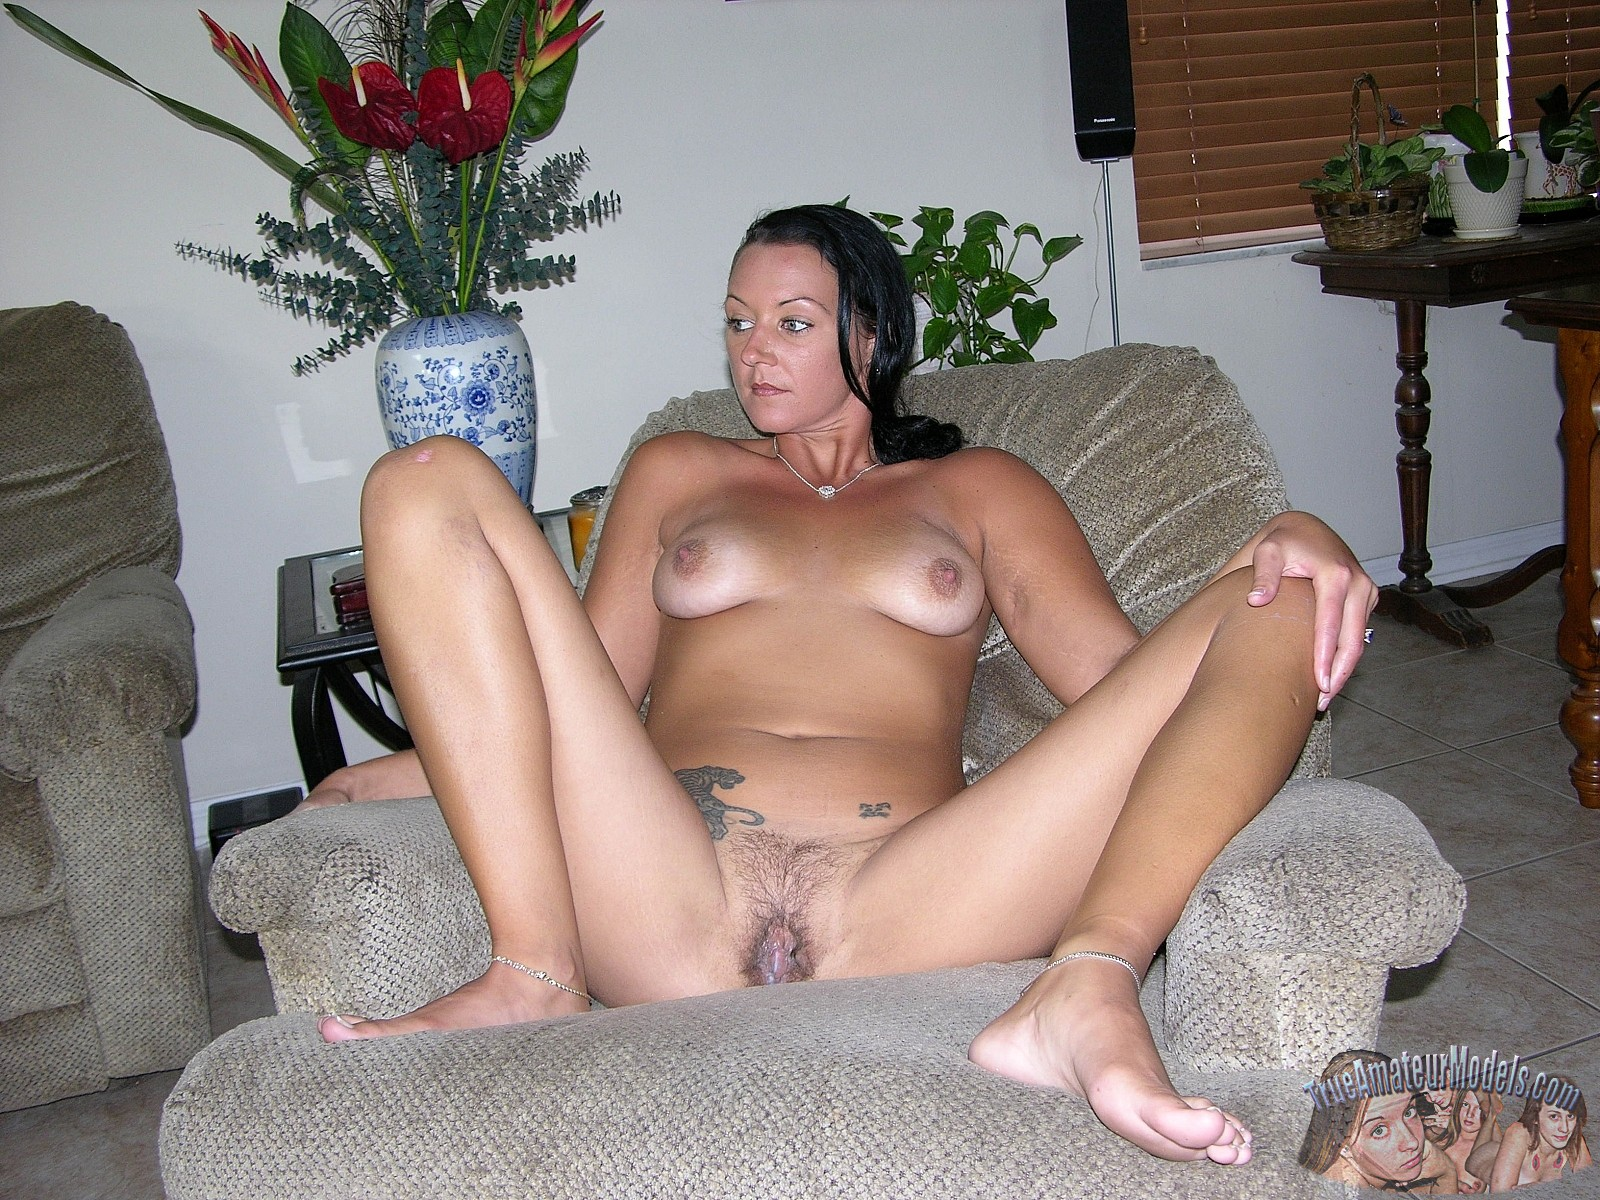 emily addison lesbian boobs